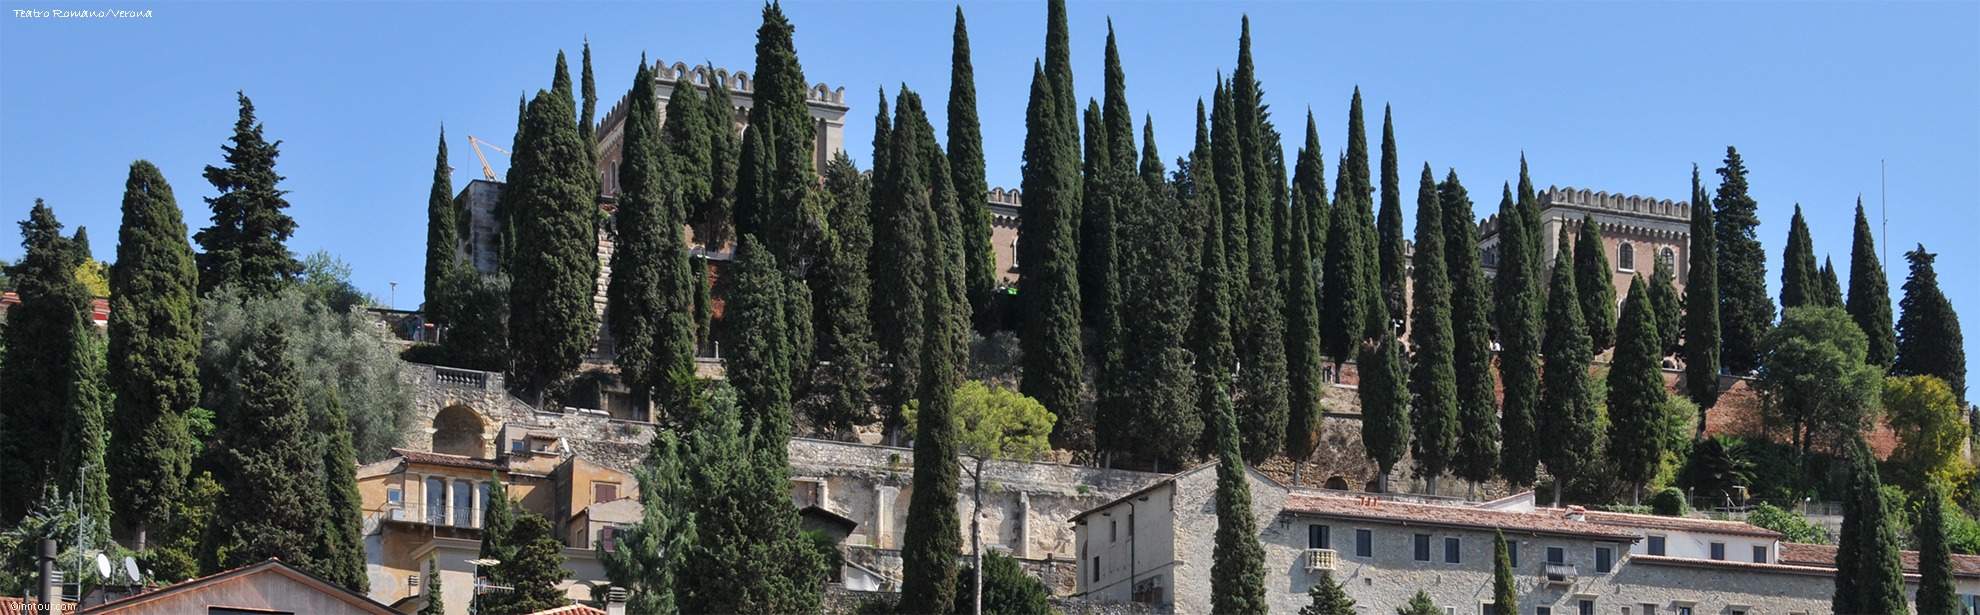 Osportinntour_Teatro-Romano_Verona_DSC_1003